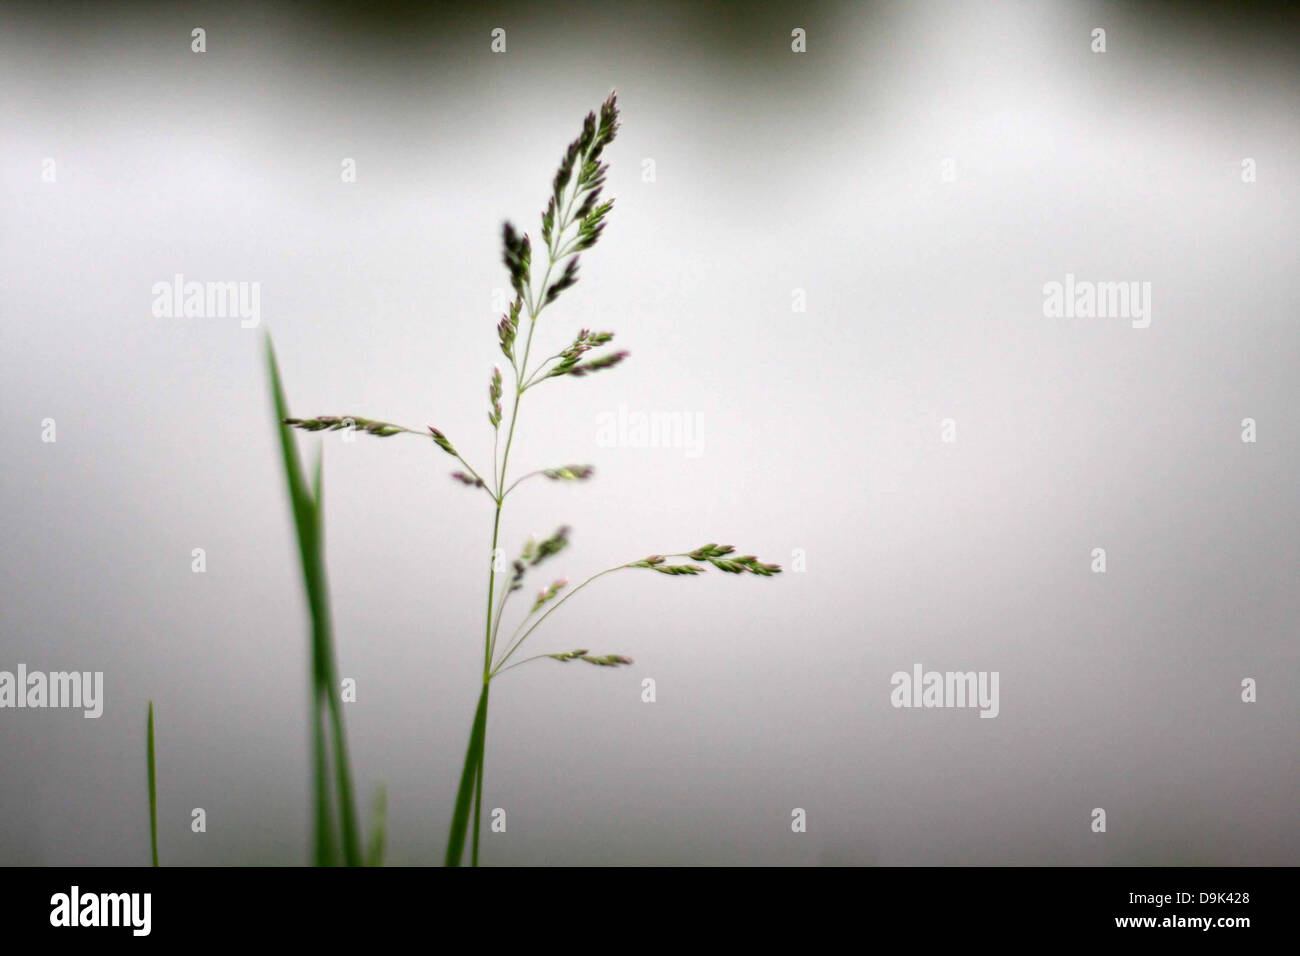 grass green blade field bloom farm rural country pond lake horizontal - Stock Image